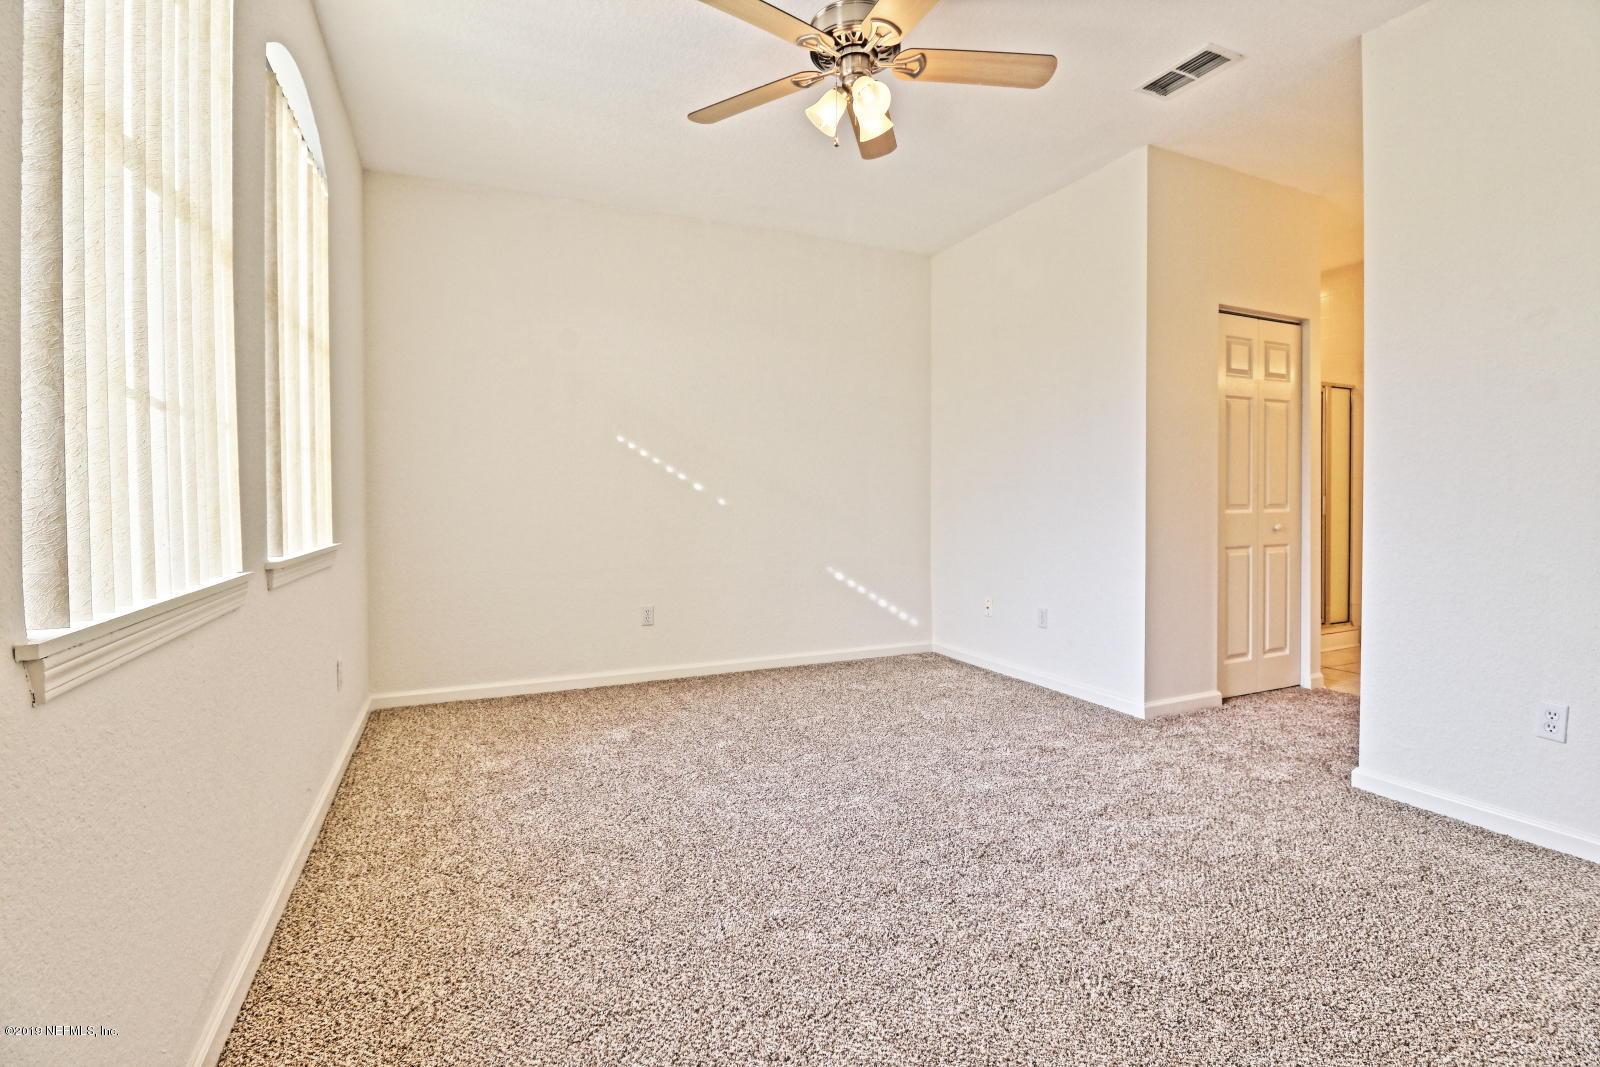 2231 VISTA COVE, ST AUGUSTINE, FLORIDA 32084, 3 Bedrooms Bedrooms, ,2 BathroomsBathrooms,Condo,For sale,VISTA COVE,995459